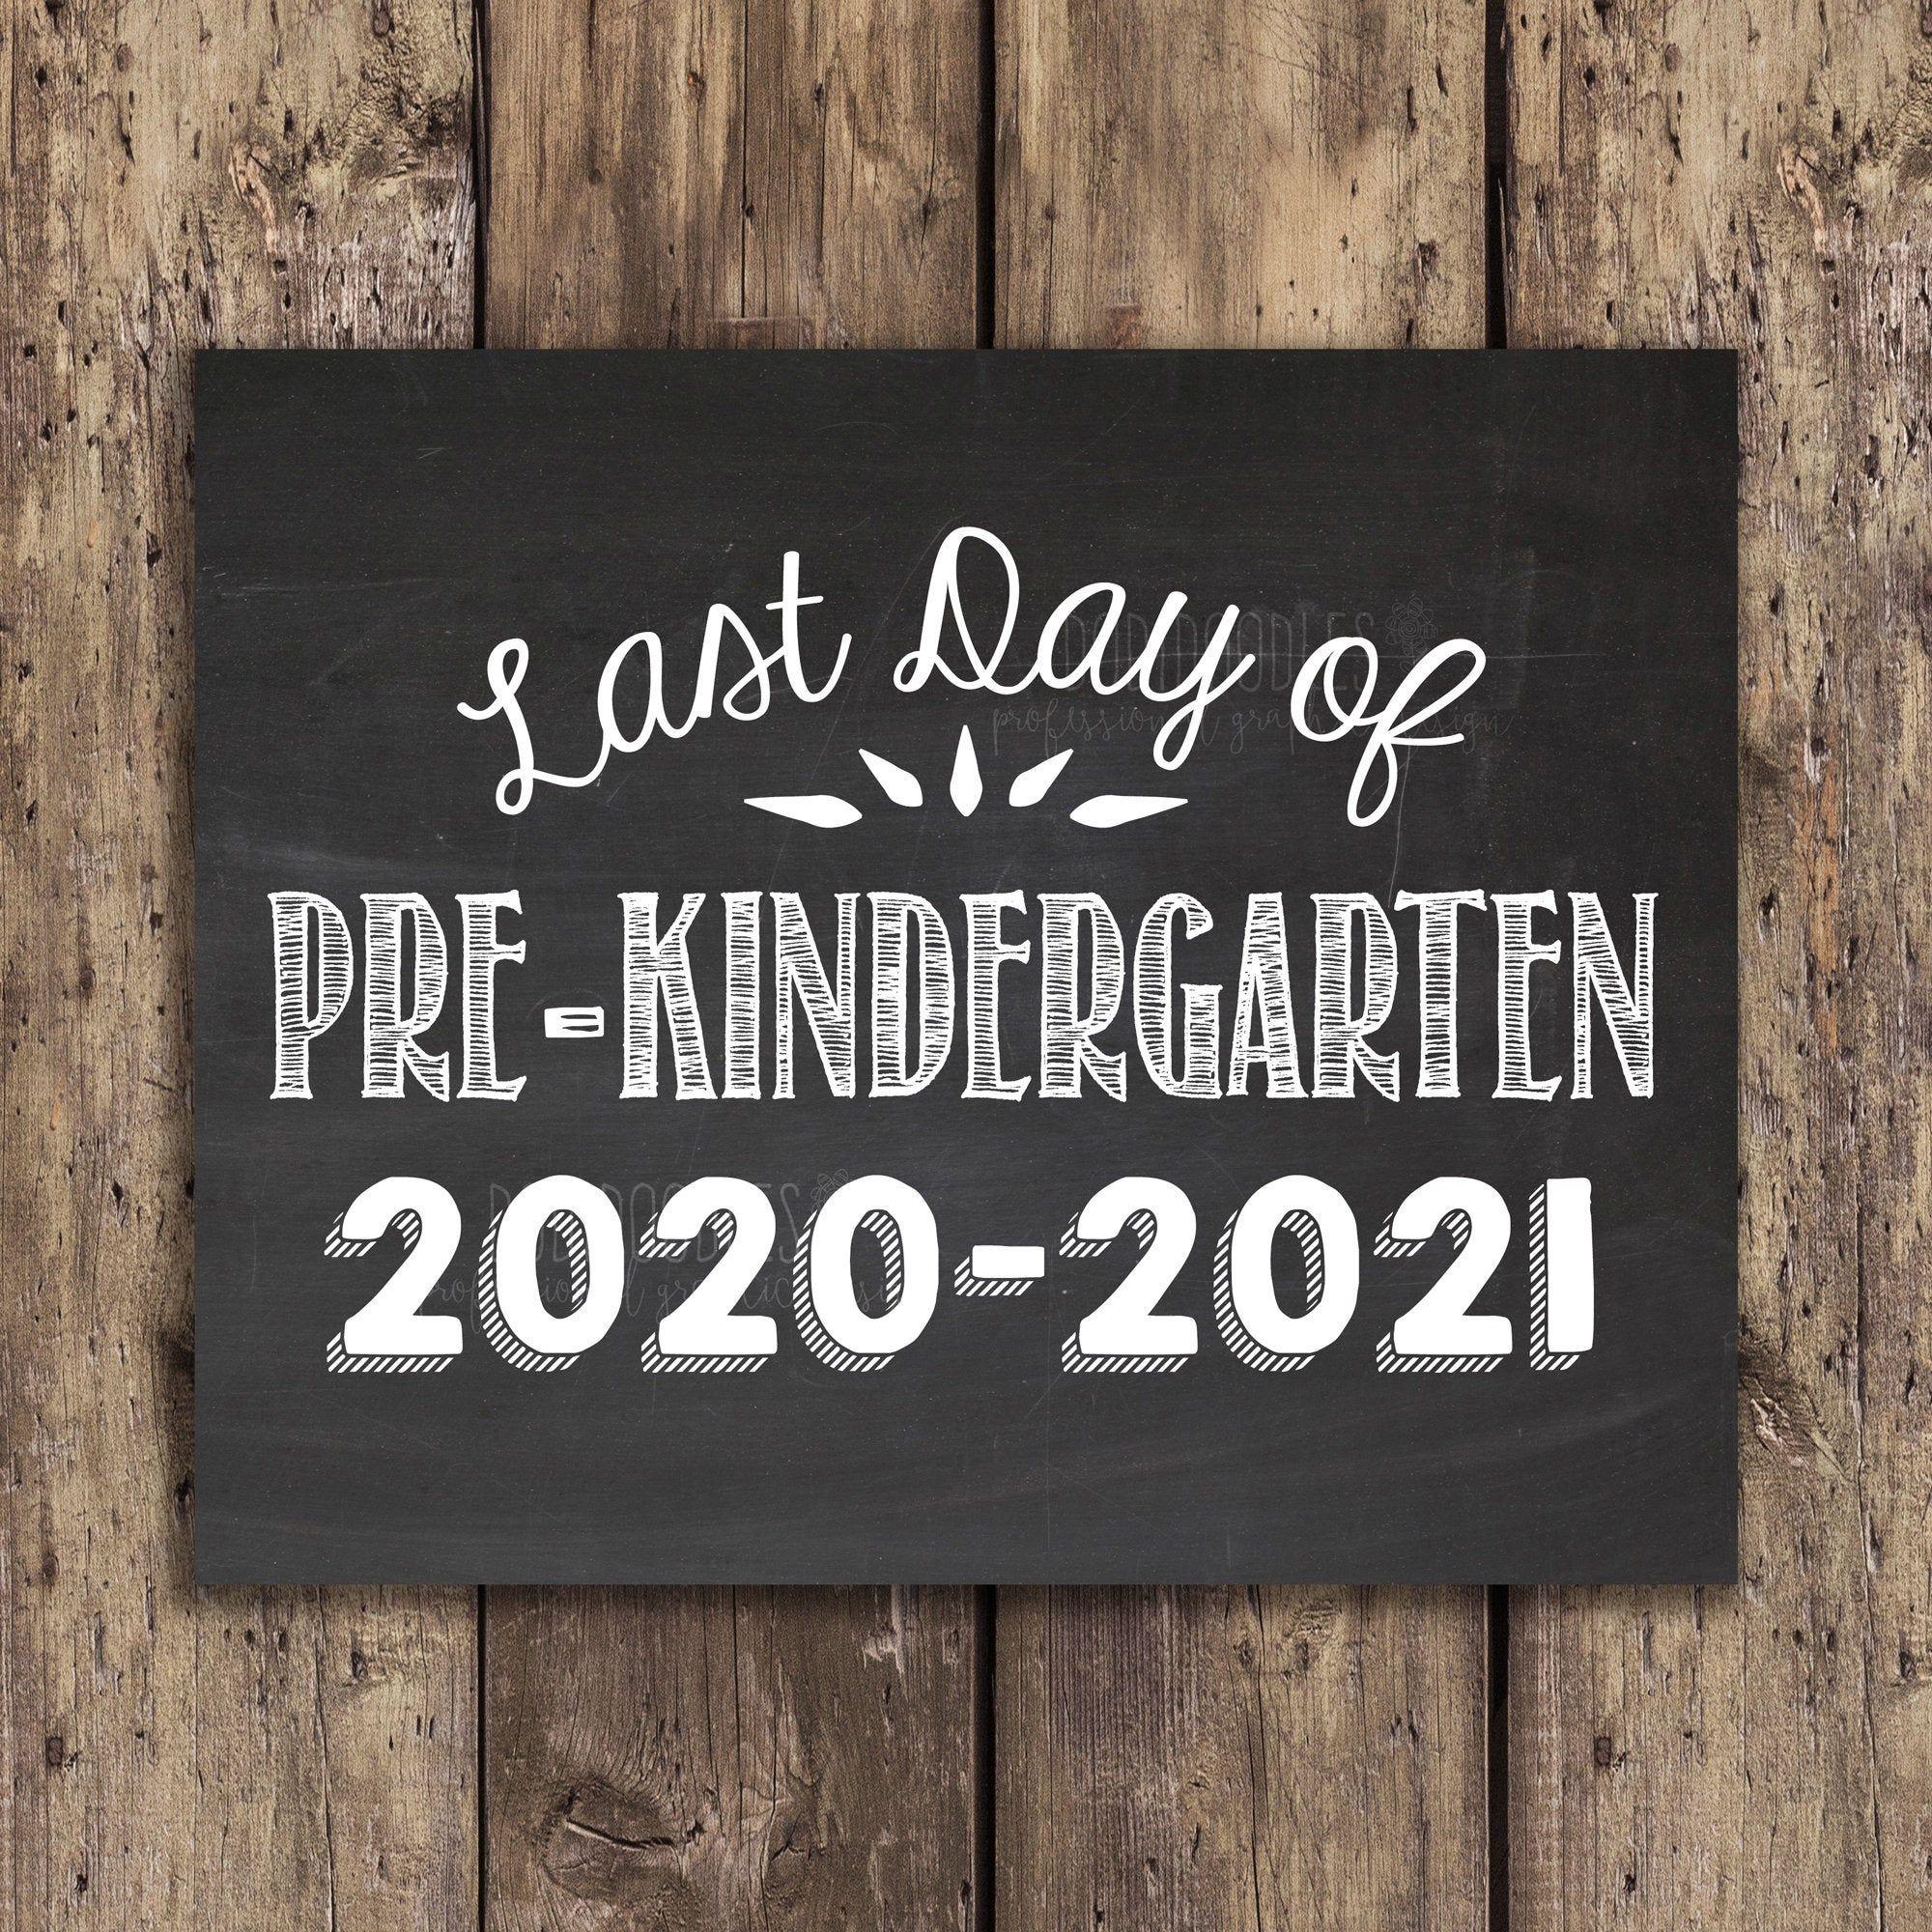 Last Day Of Pre K Pre Kindergarten